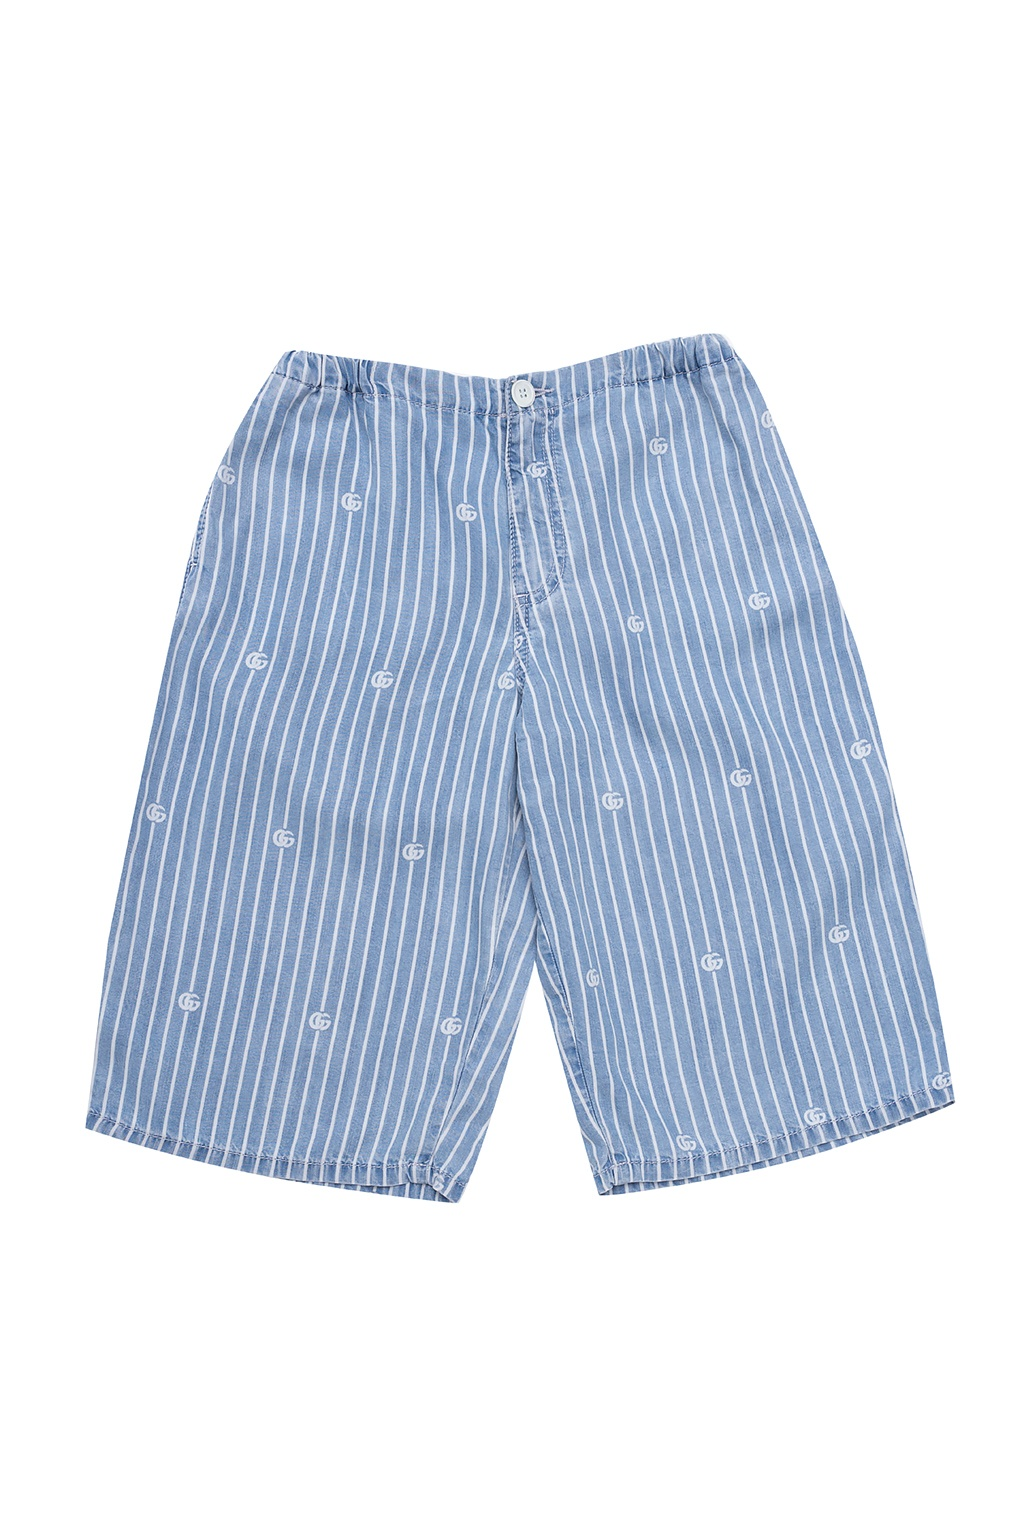 Gucci Kids 品牌短裤